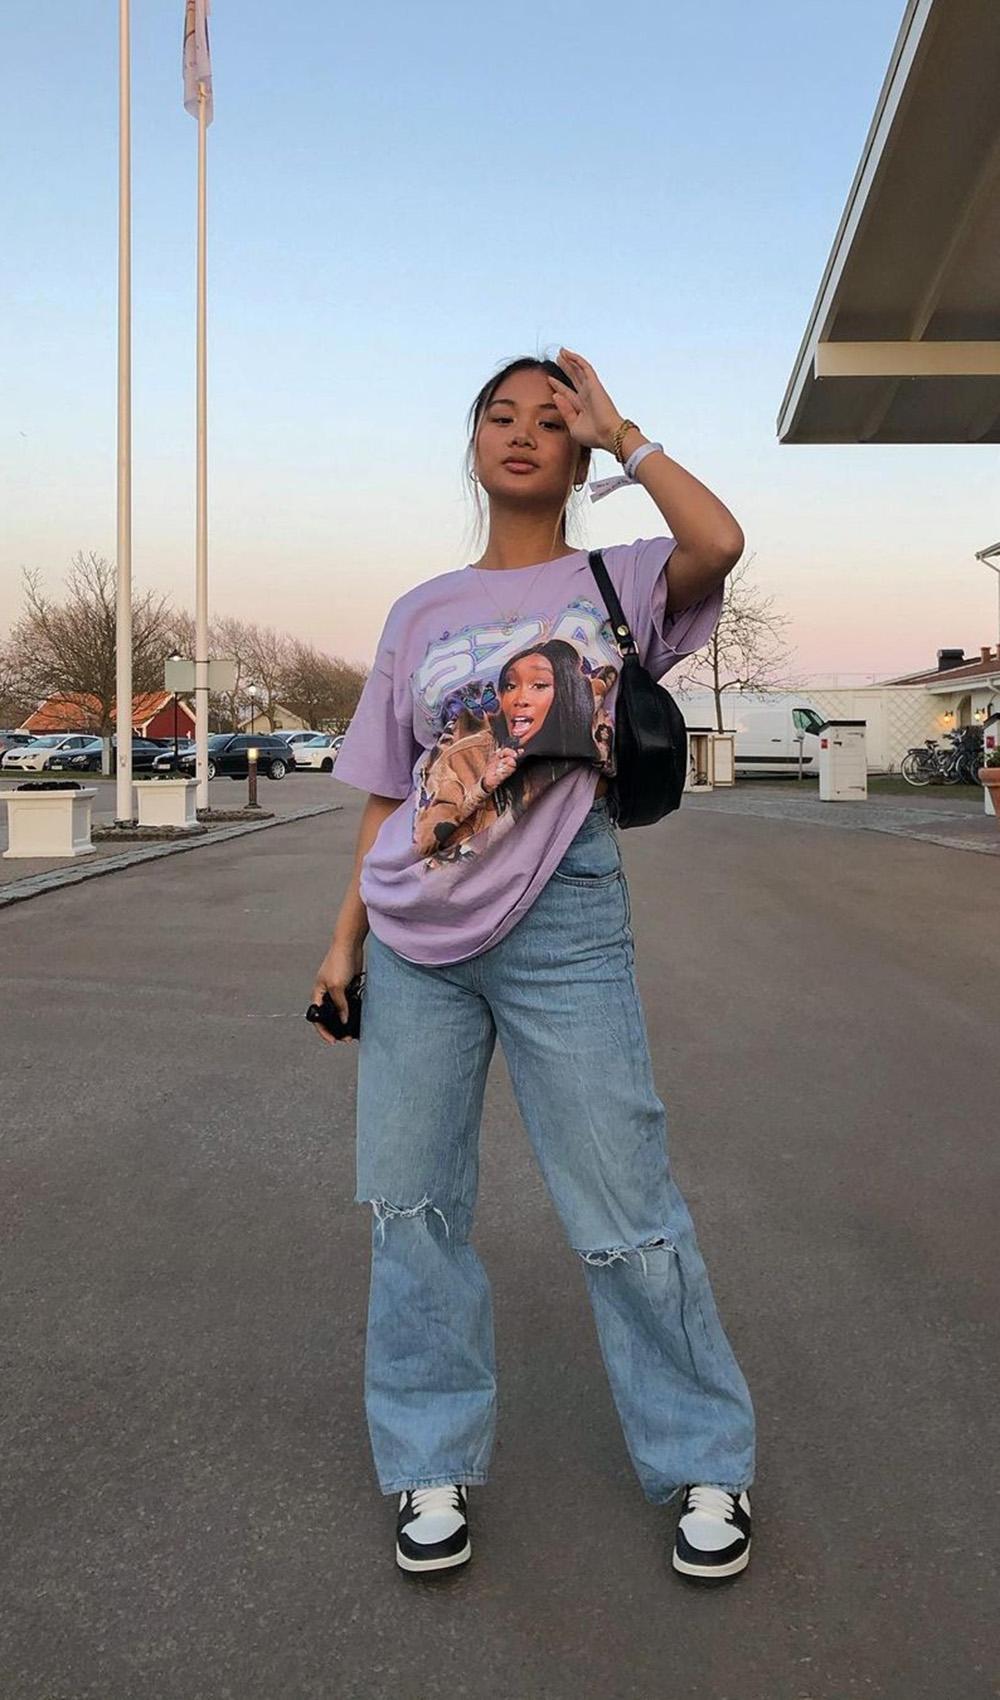 blusão lilás, calça jeans wide leg e tênis nike